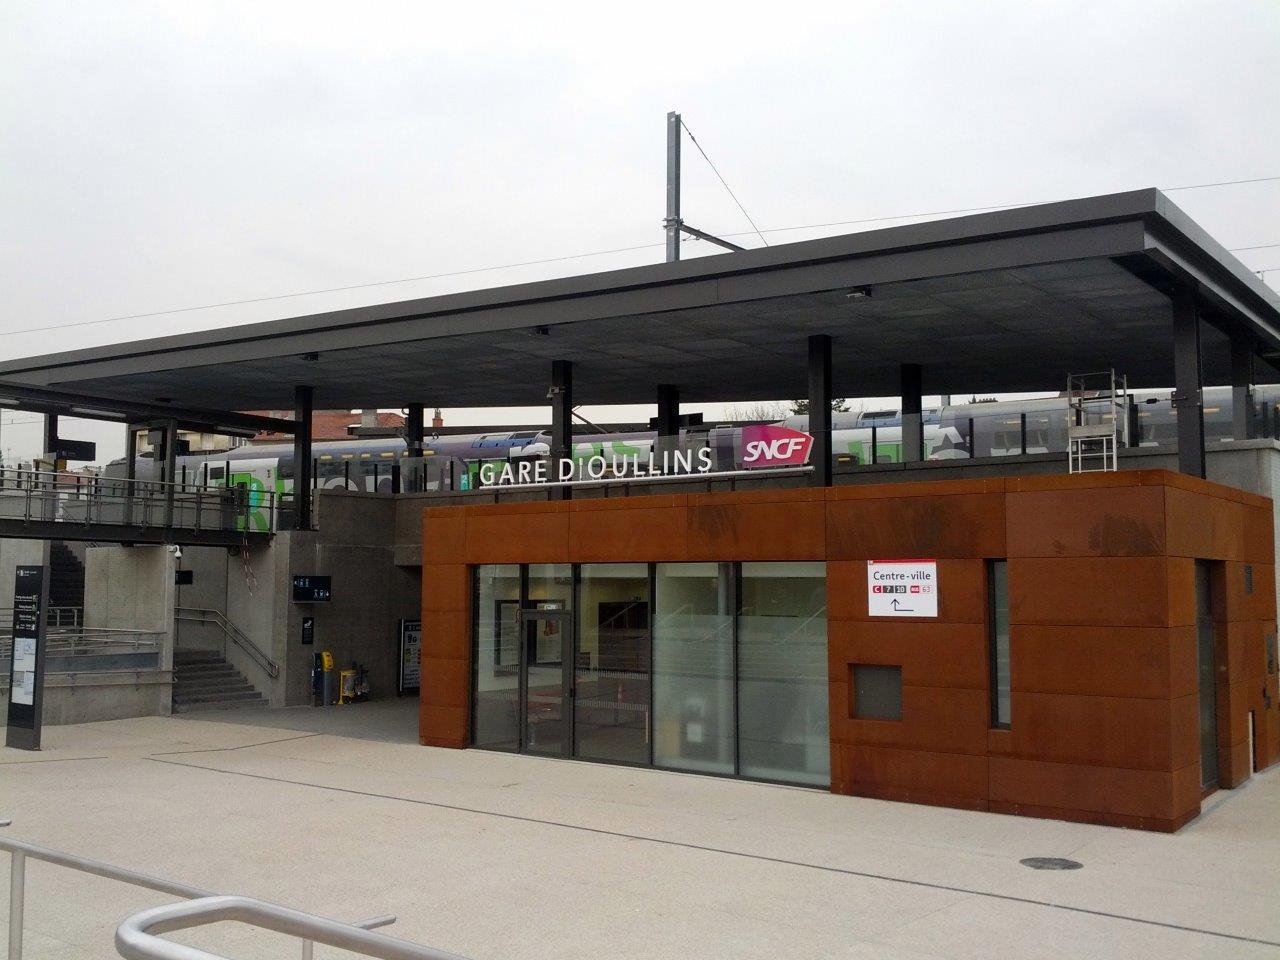 gare-d-oullins-train-station